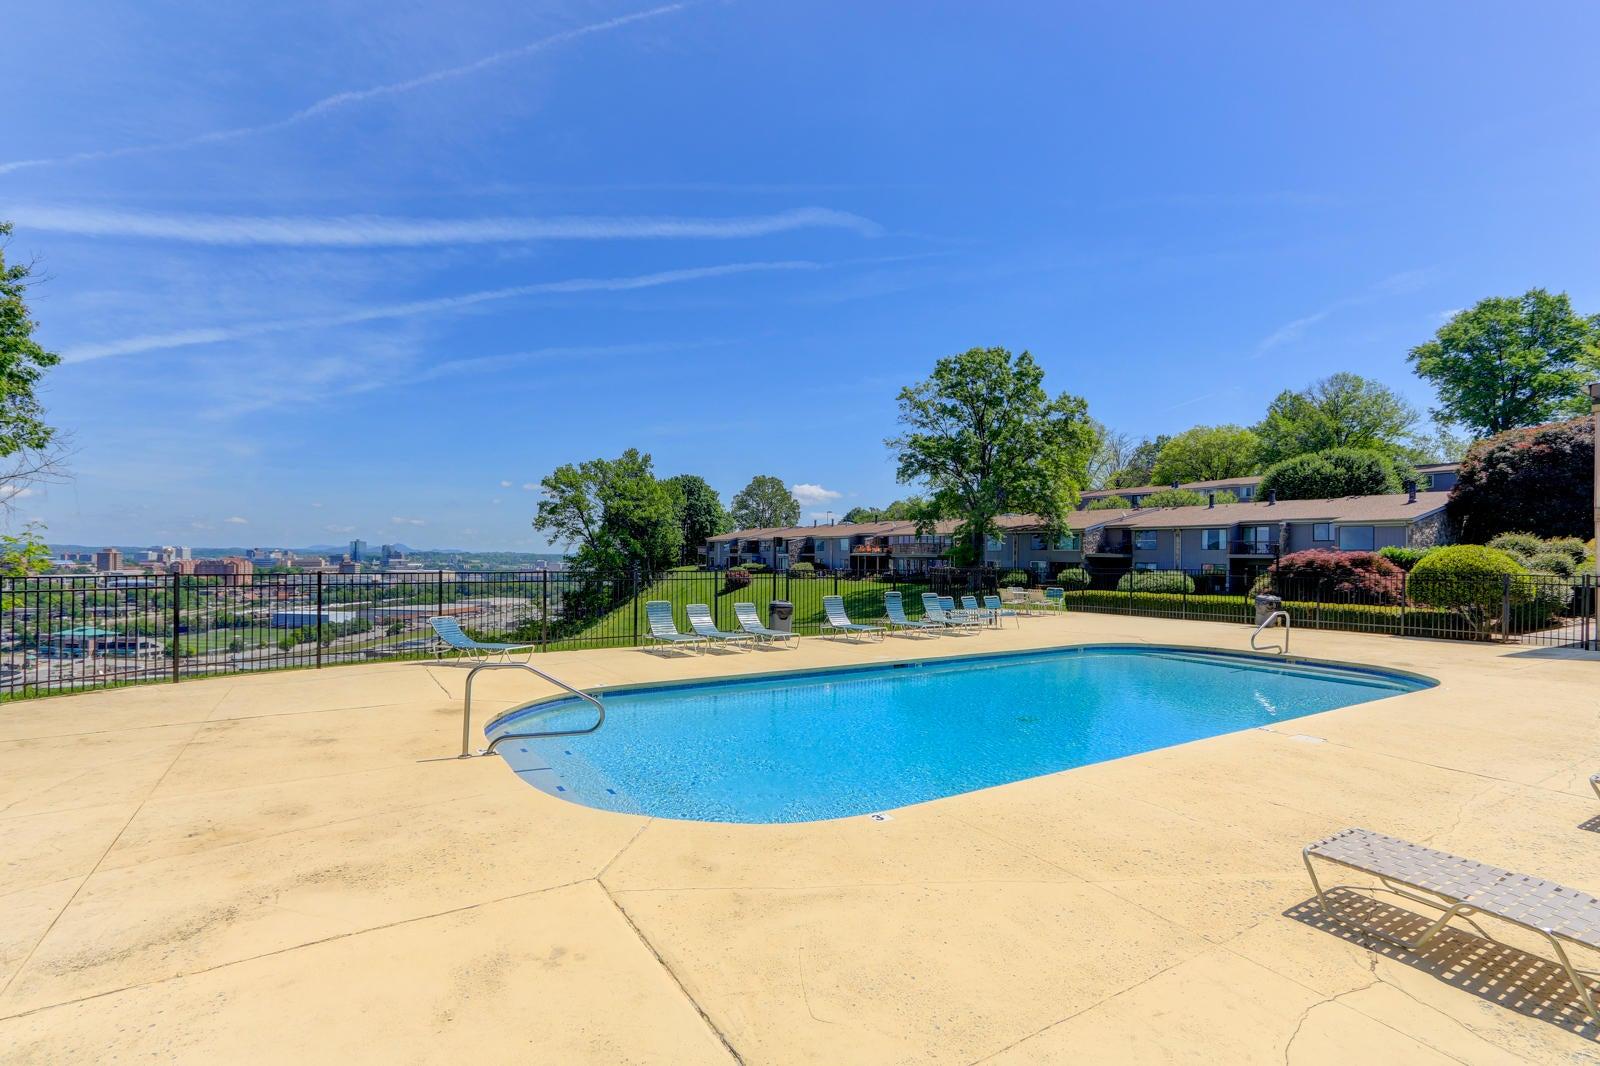 Pool View 2